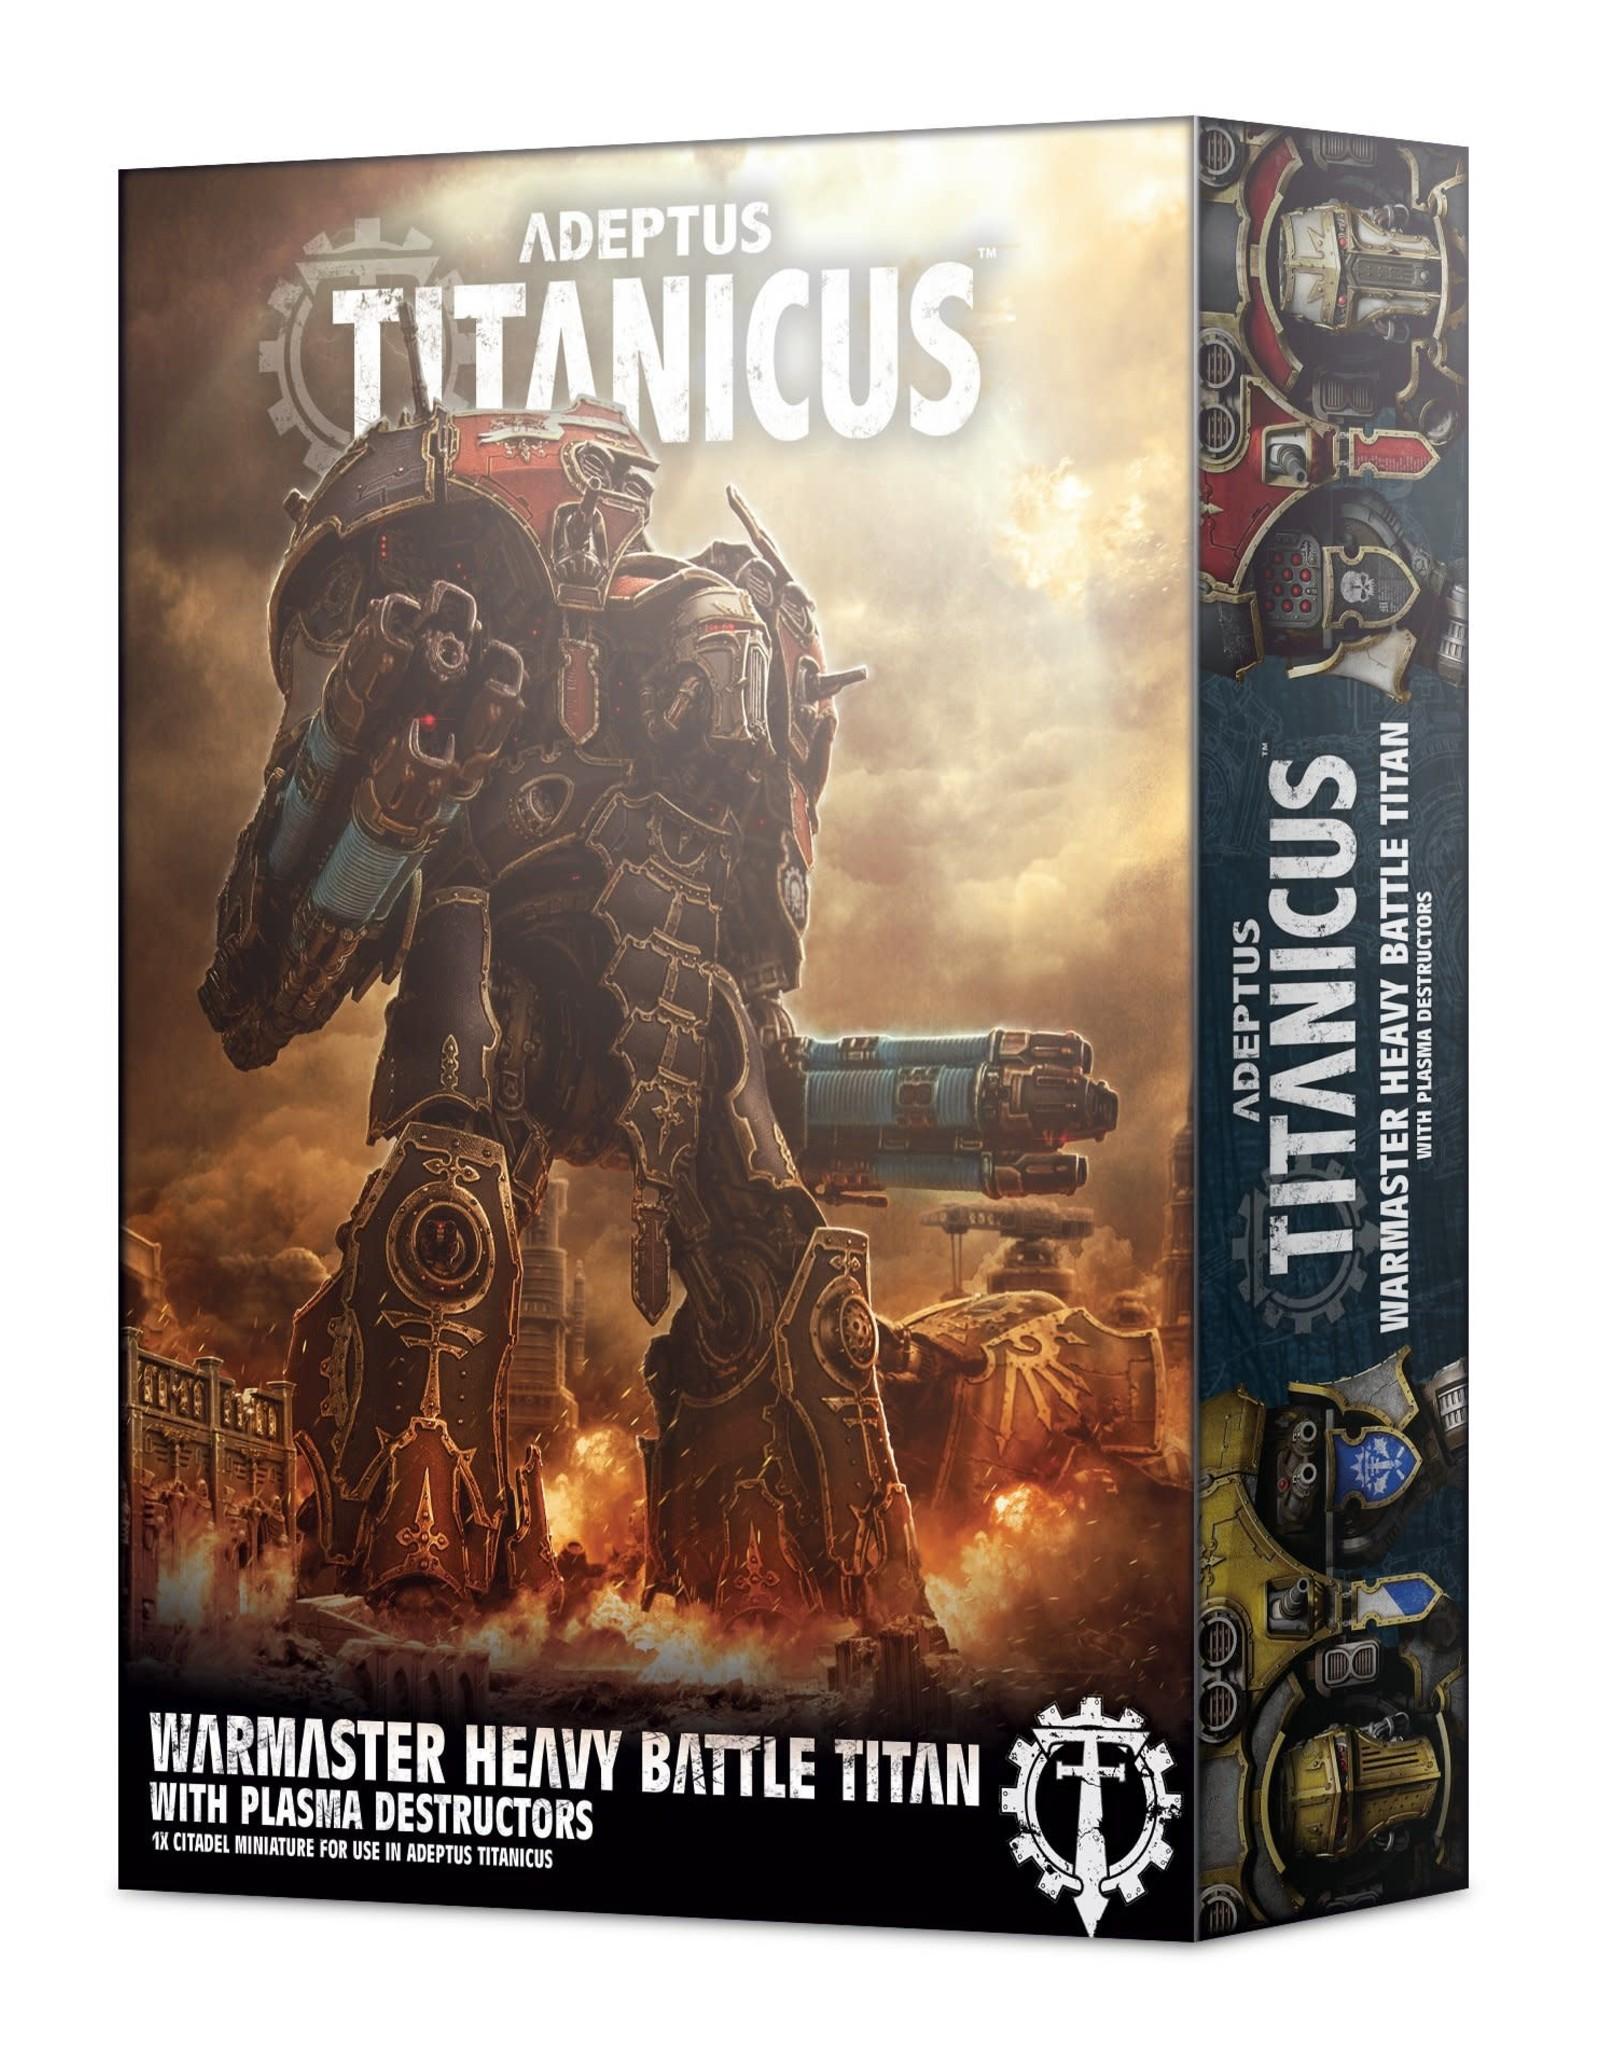 Games Workshop Adeptus Titanicus: Warmaster Heavy Battle Titan w/ Plasma Destructors